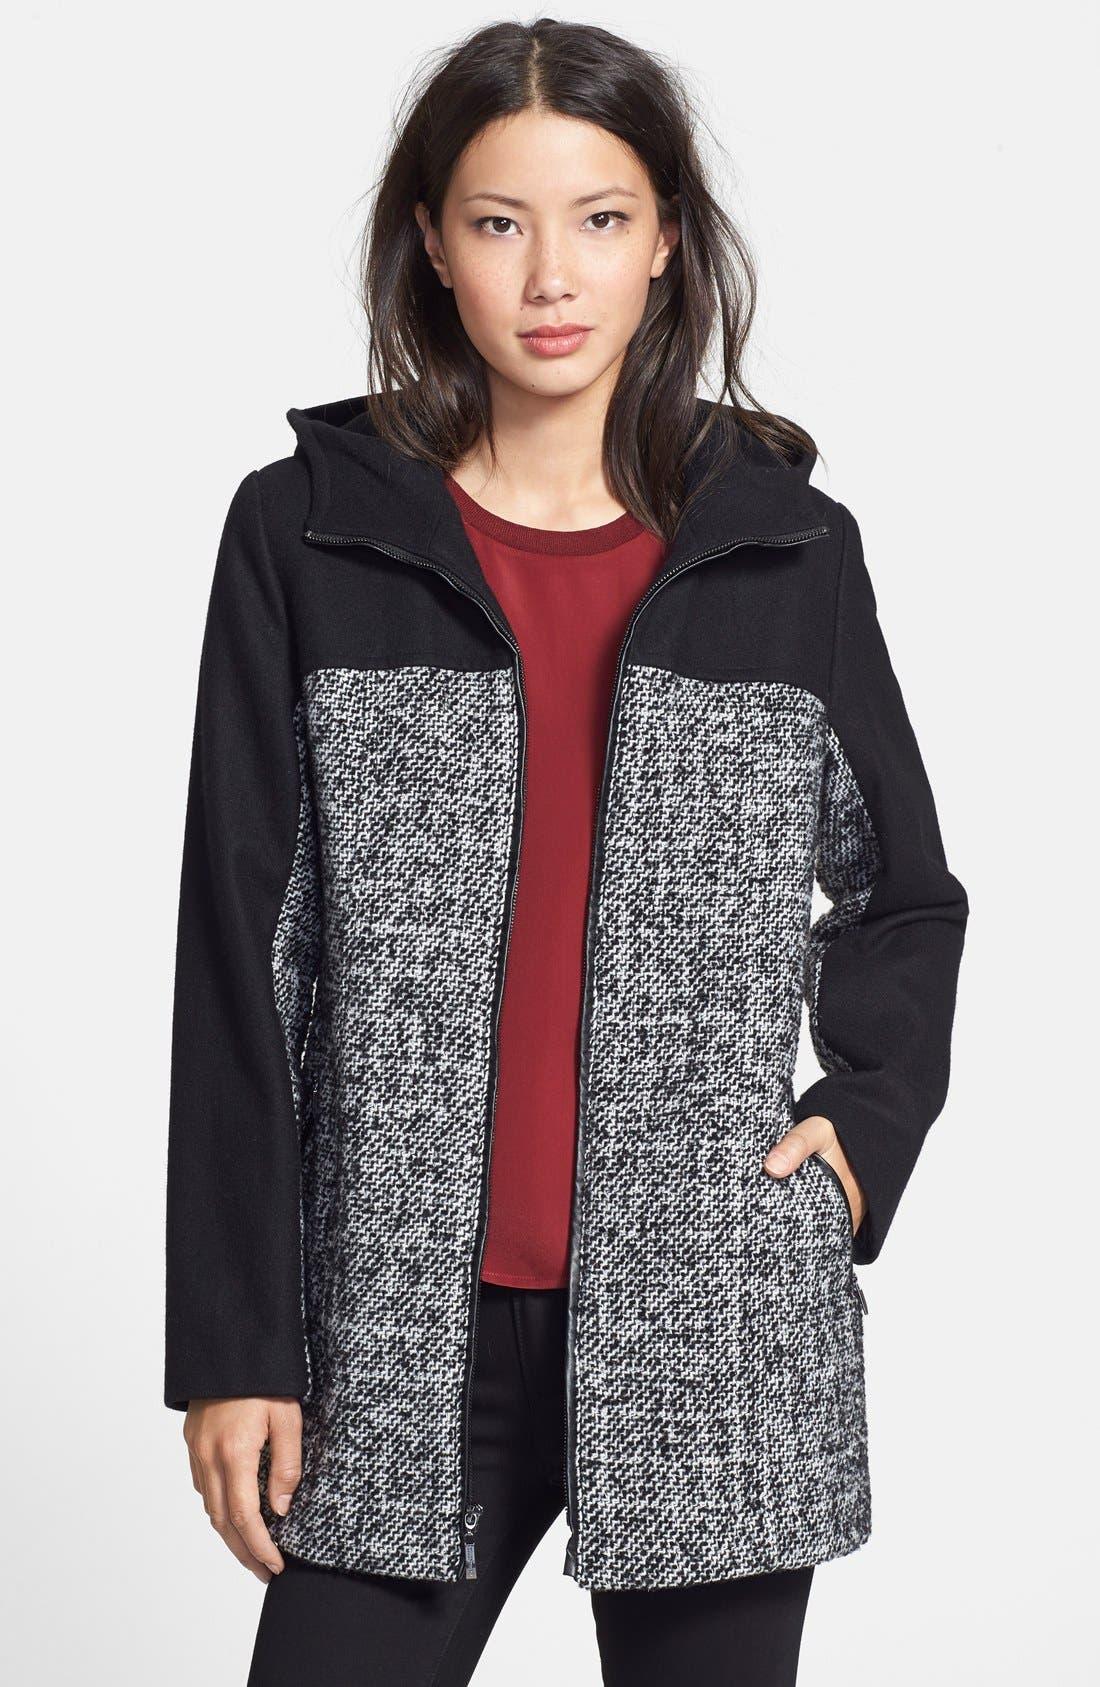 Alternate Image 1 Selected - Ellen Tracy Colorblock Tweed Car Coat (Regular & Petite) (Online Only)